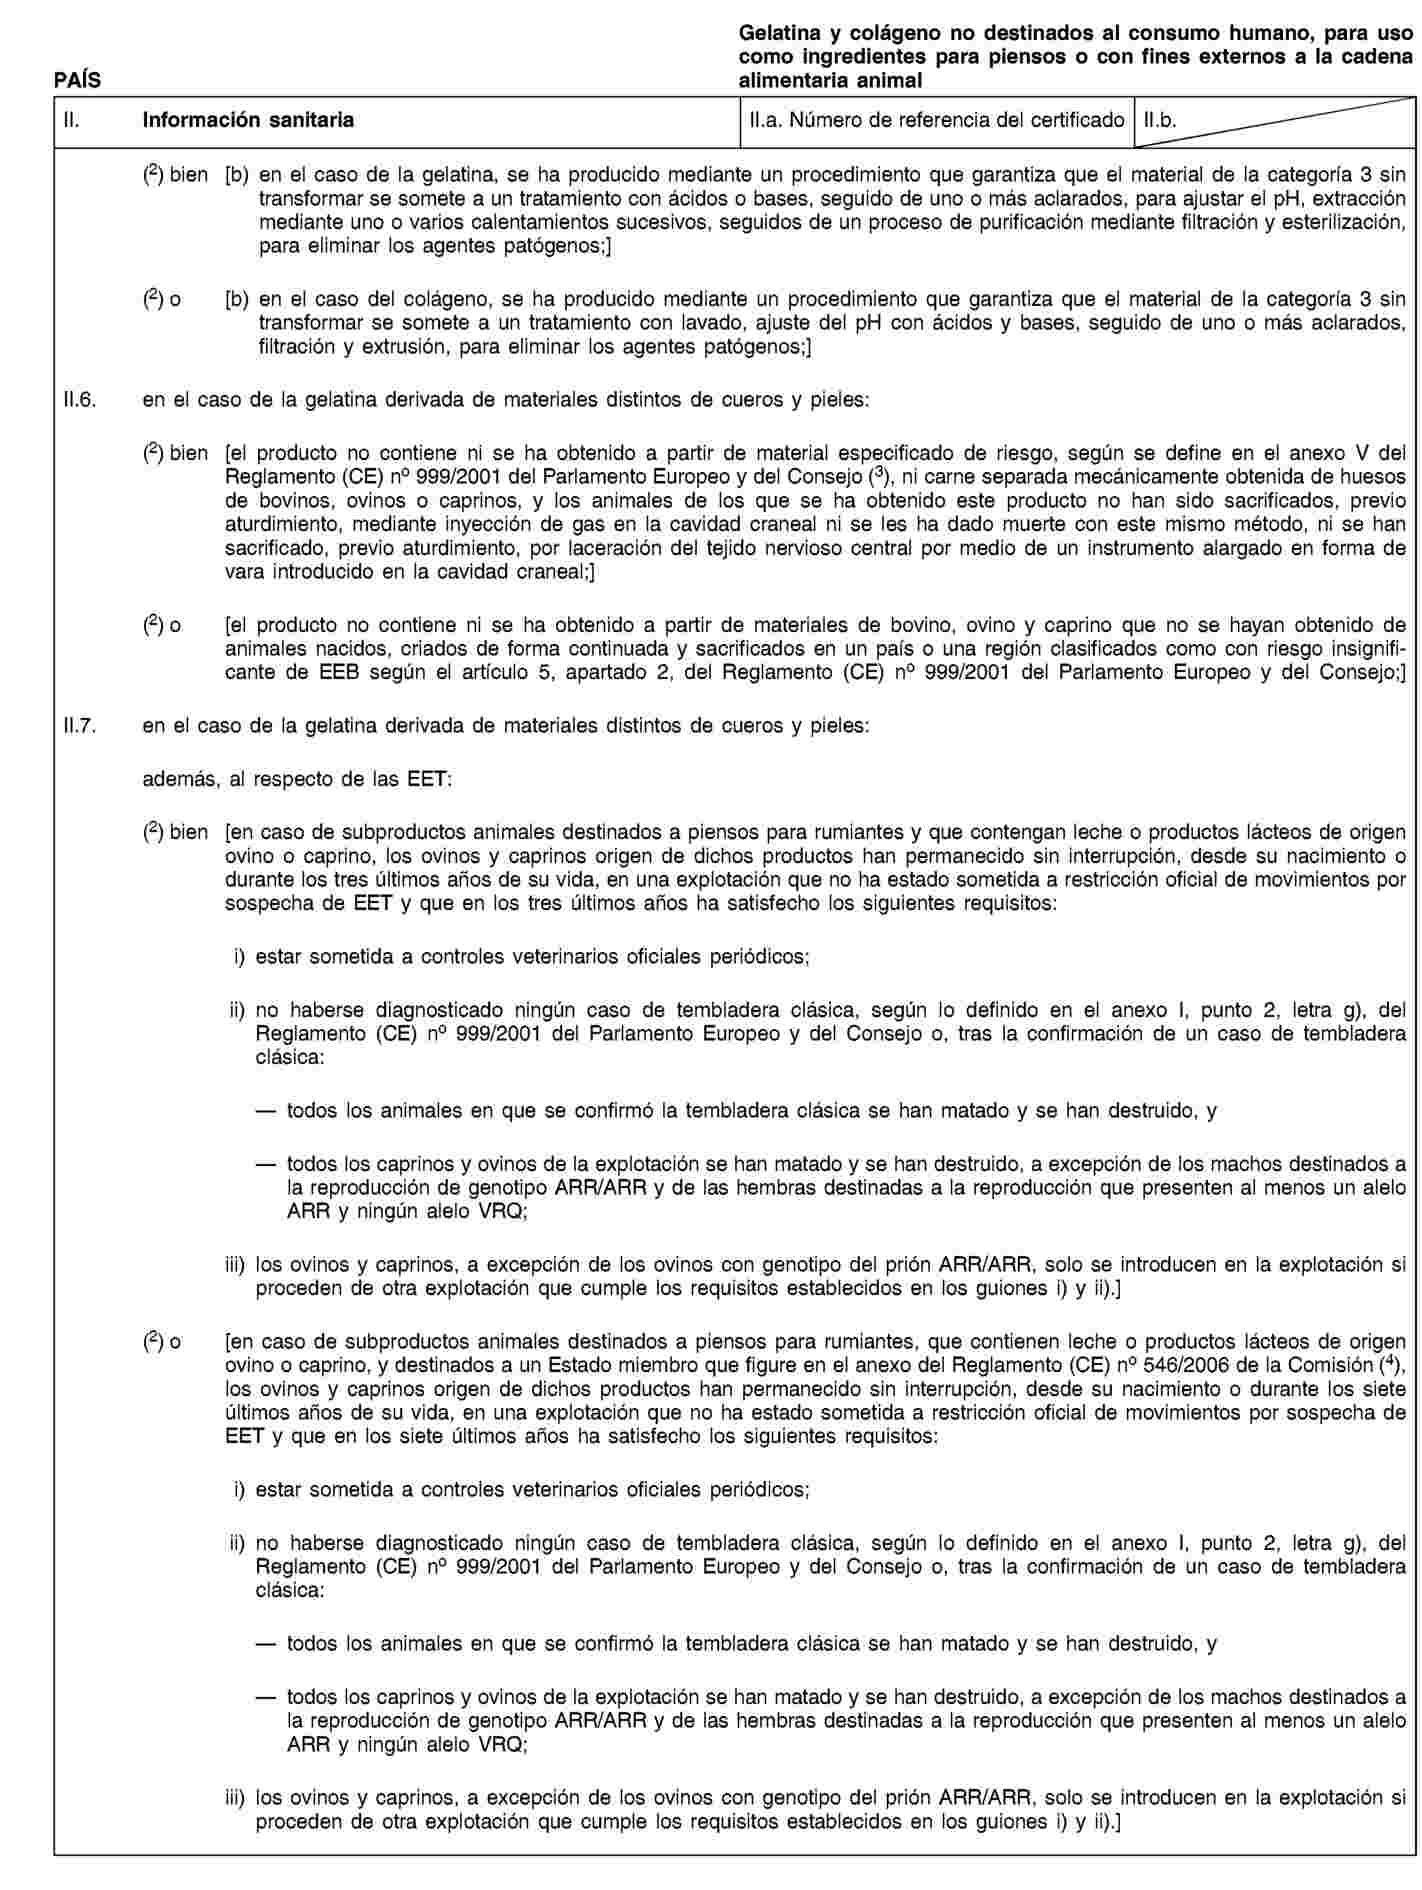 Imagen: https://eur-lex.europa.eu/resource.html?uri=uriserv:OJ.L_.2011.054.01.0001.01.SPA.xhtml.L_2011054ES.01021601.tif.jpg